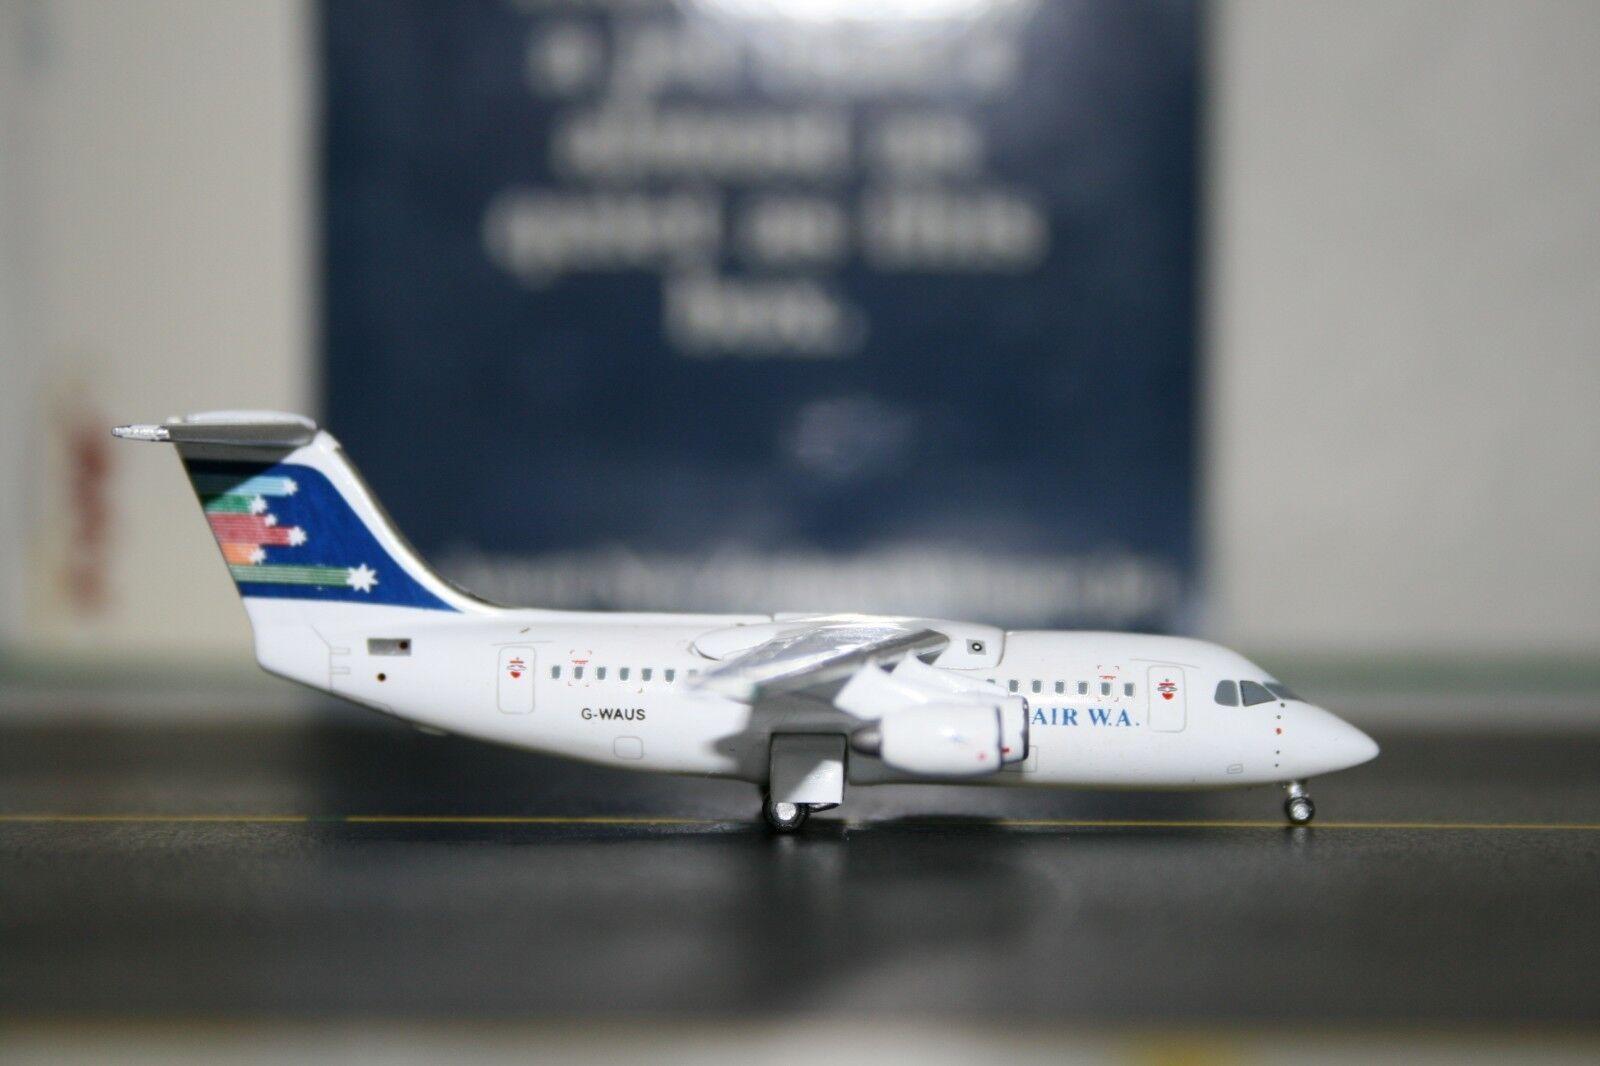 Jet-x 1 400 ansett luft wa bae-146 g-waus (jx339) sterben mit modellflugzeug